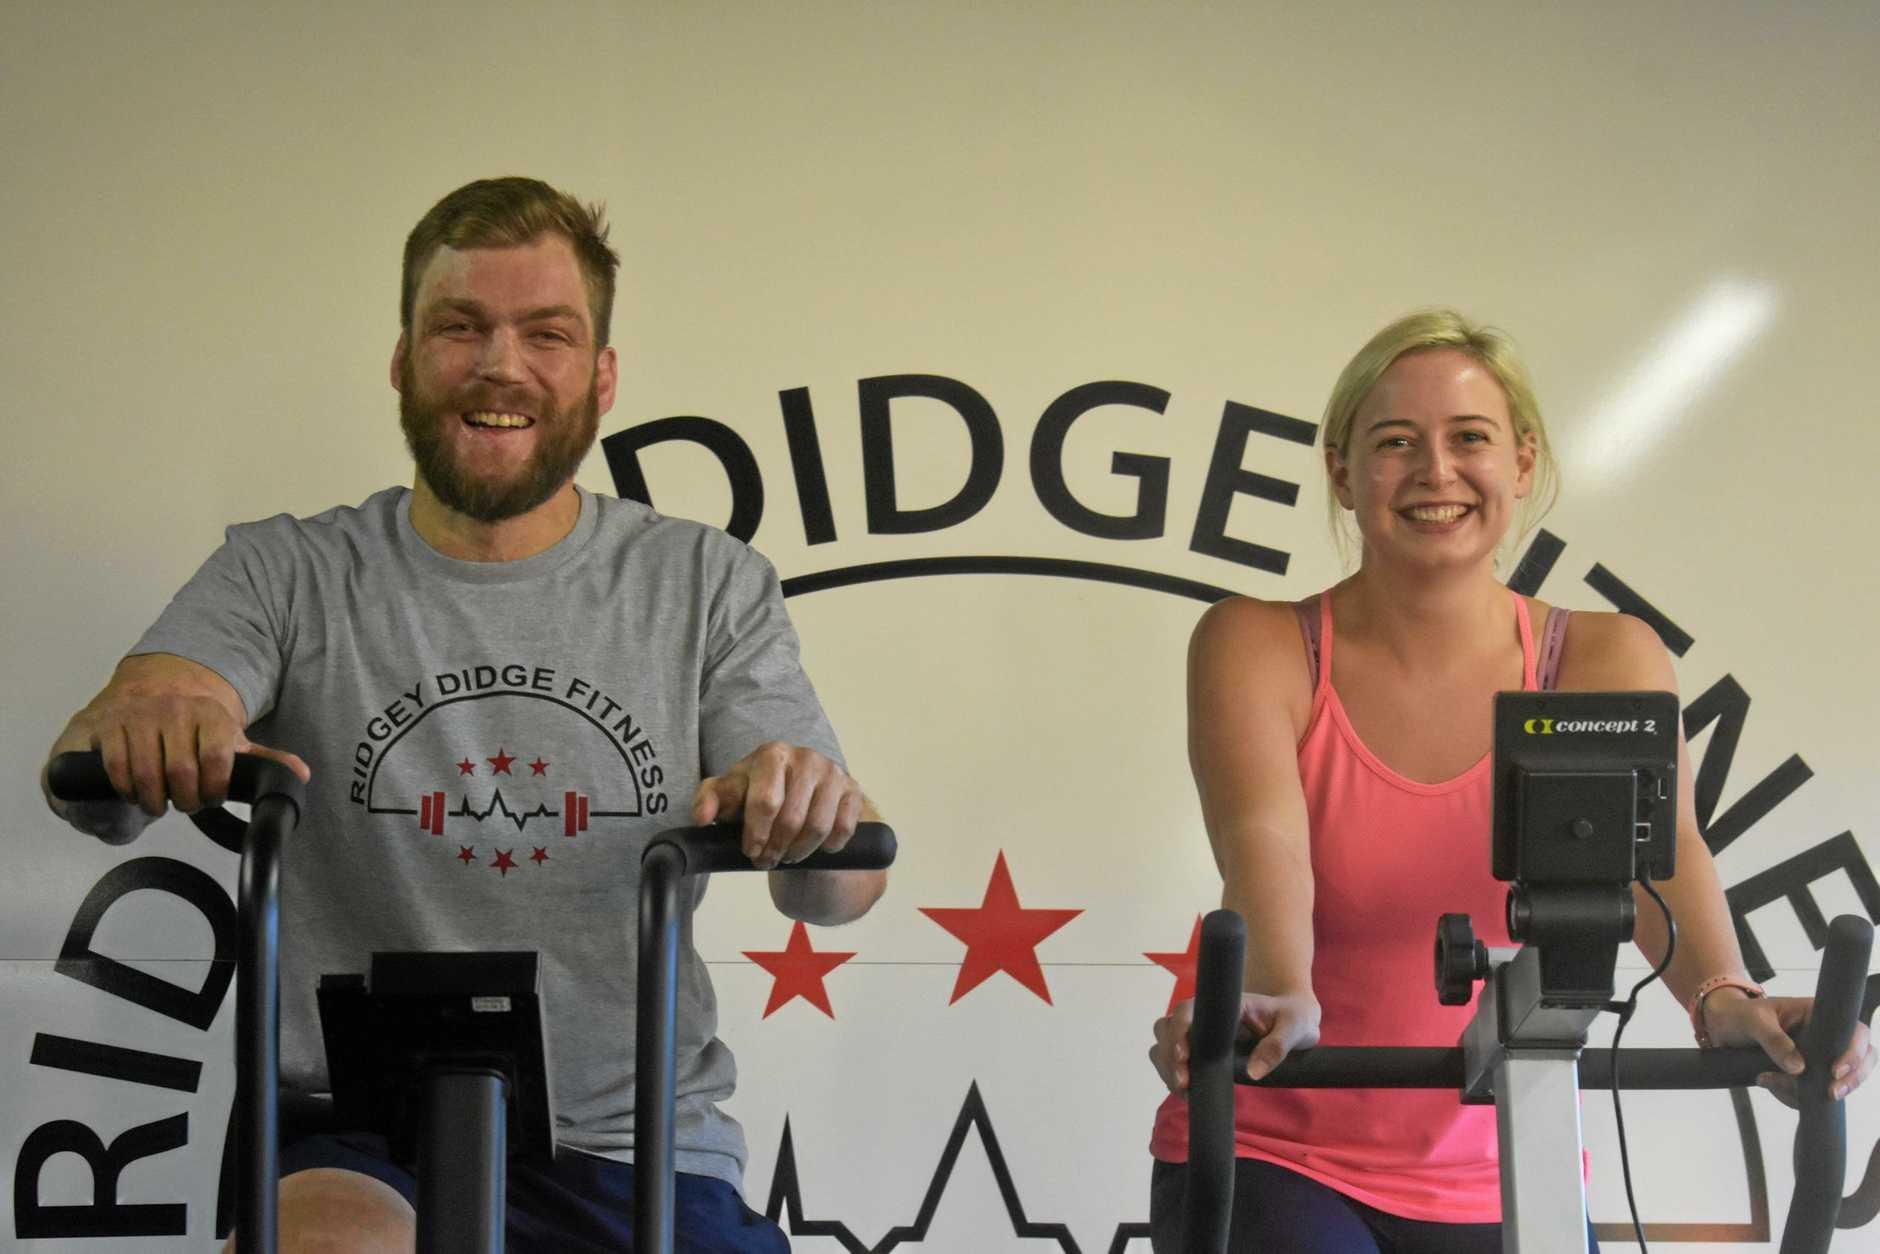 WINNERS: Tom Zerk and Georgie Gibson, who get married today, were winners for Ben Ridge's Ridgey Didge Fitness eight-week challenge.